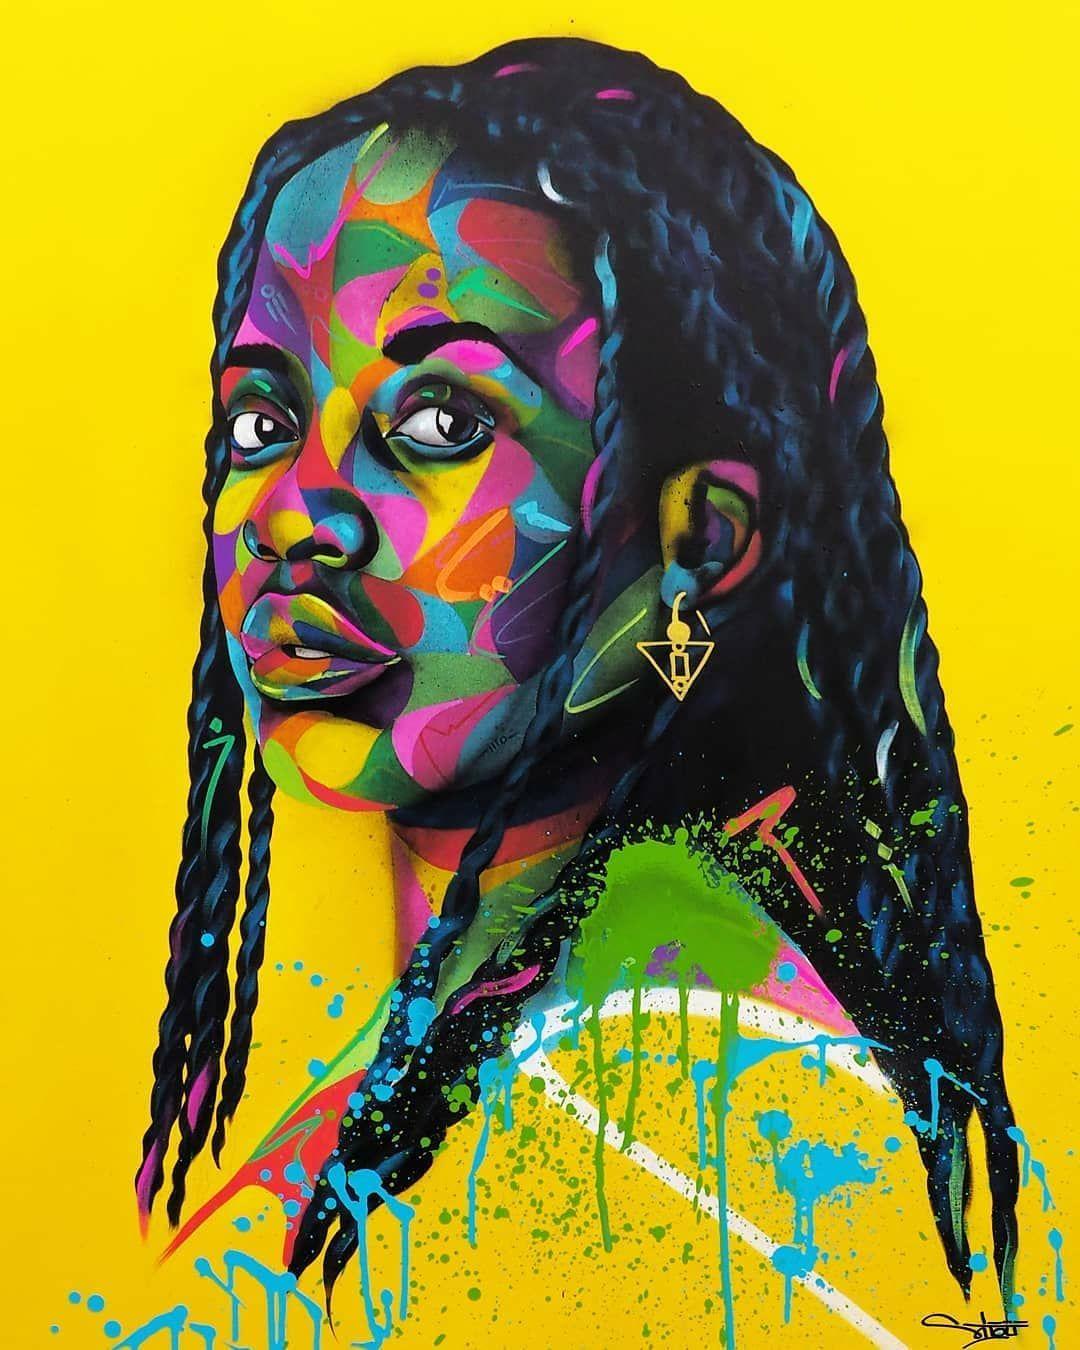 🎨 #Dopeblackart by @sitoumatt MONAFRICA 116×81 cm #photography #art #blackart #artoftheday#artfeature #artdaily #igart#digitaldrawing #realisticdrawing #pencildrawing #artspotlight #igartist #drawing #coolart #dopeart #blackartwork #artgallery #supportblackart #blackartist #coolartwork #artfido#artlife #artwork #dopeblackartist #dopeblackart #Artistatwork #dopeartistatwork For art subs or any business >>dopeblackart.com